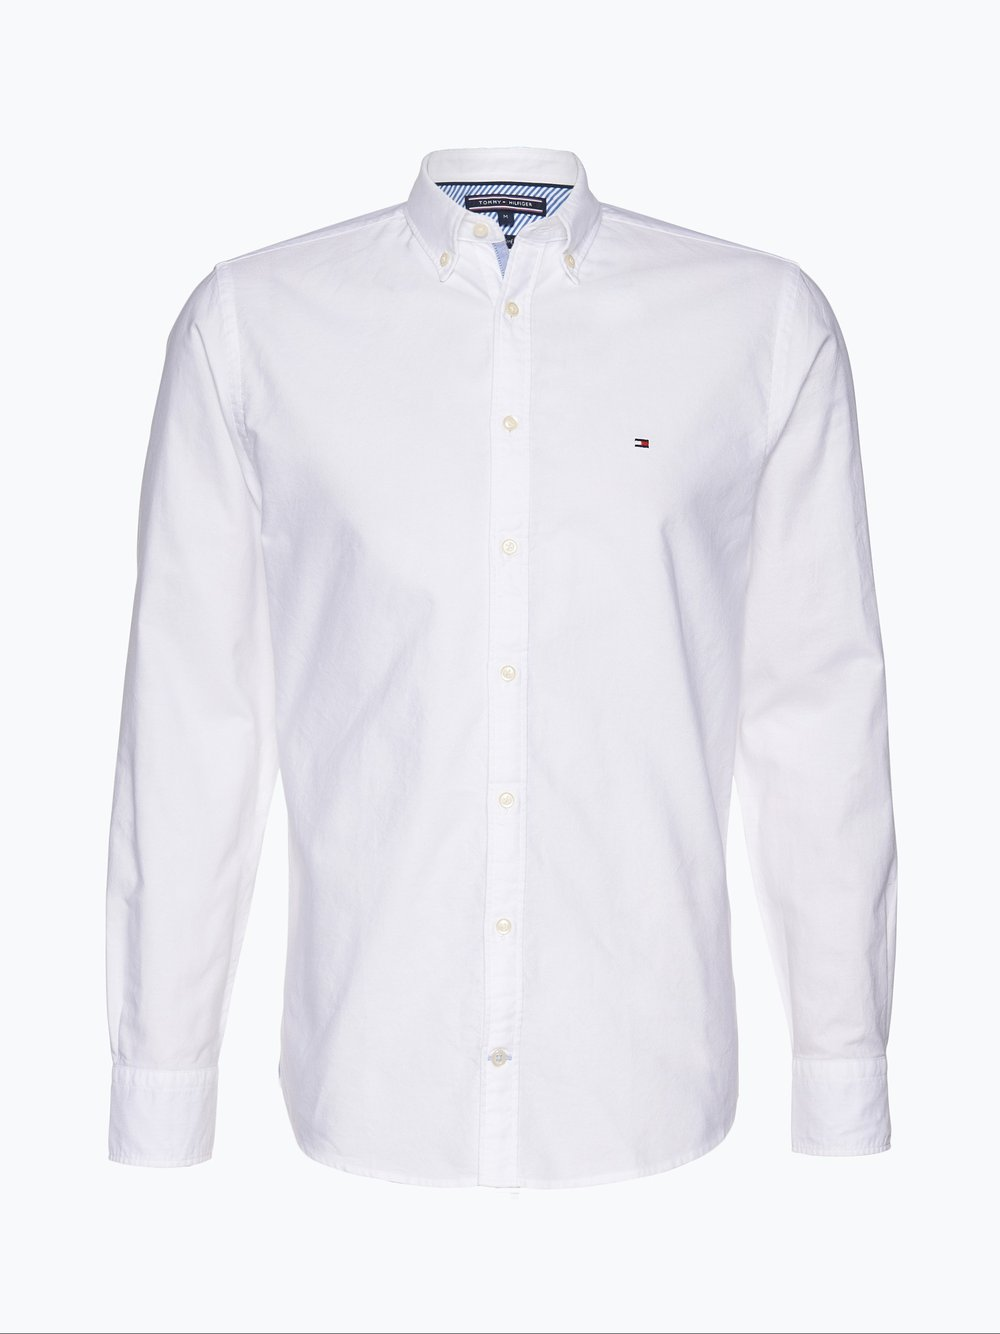 f459c9e4a7a79 Tommy Hilfiger Koszula męska Oxford – Ivy kup online | VANGRAAF.COM